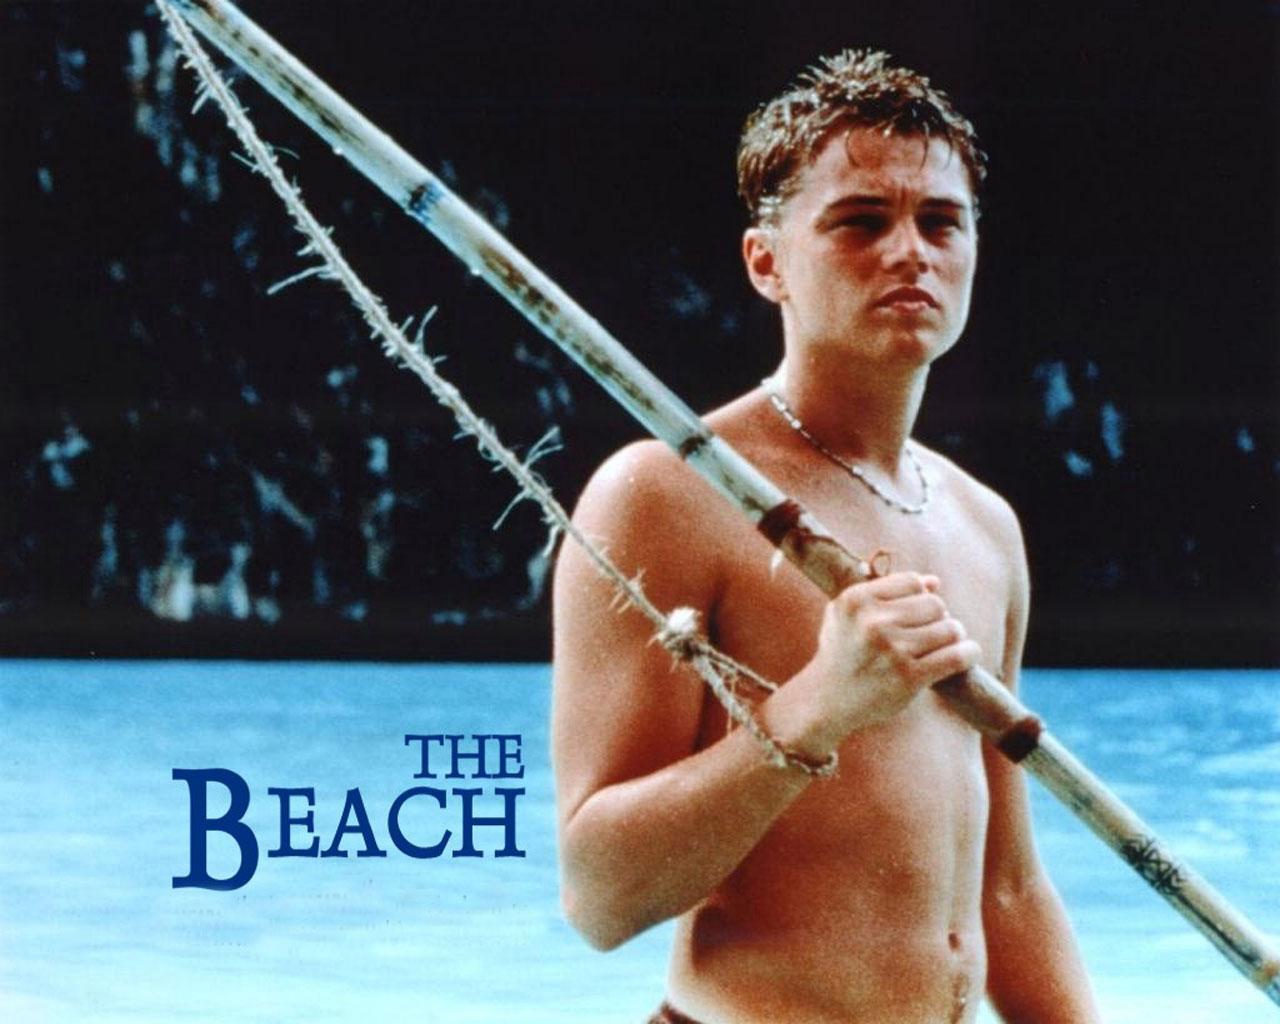 The-Beach-2000